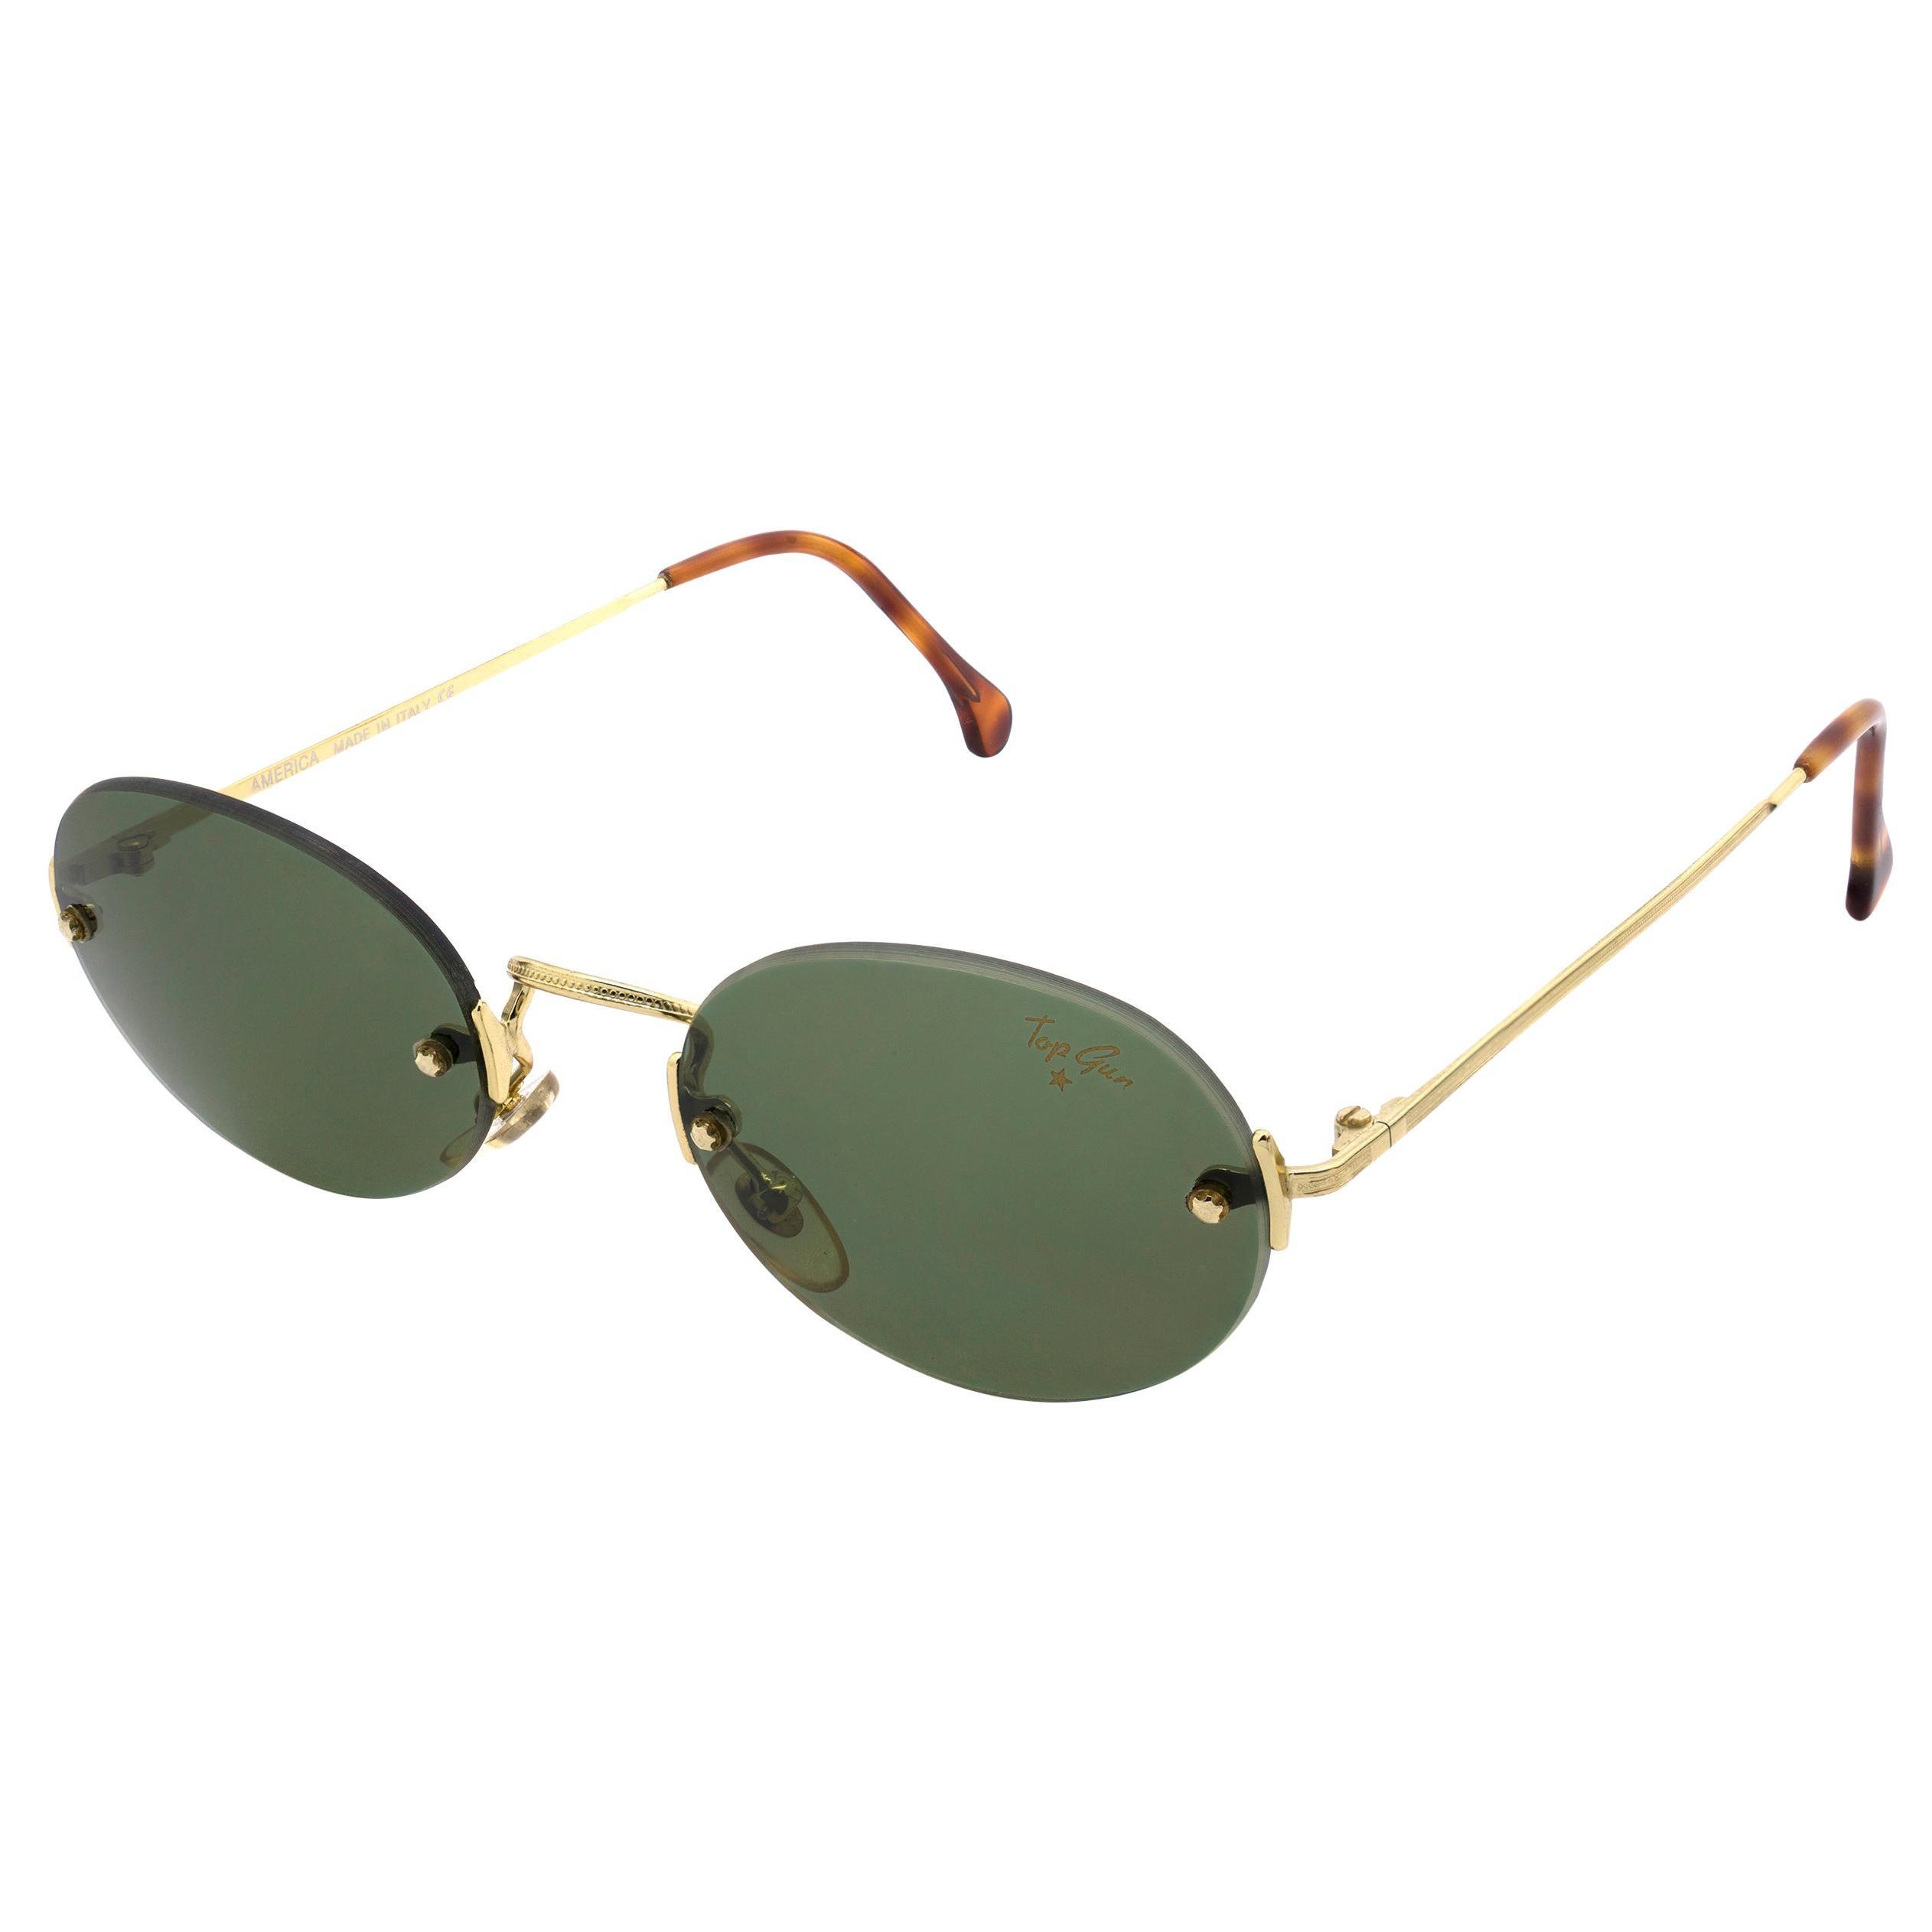 Top Gun® oval rimless vintage sunglasses, Italy 90s